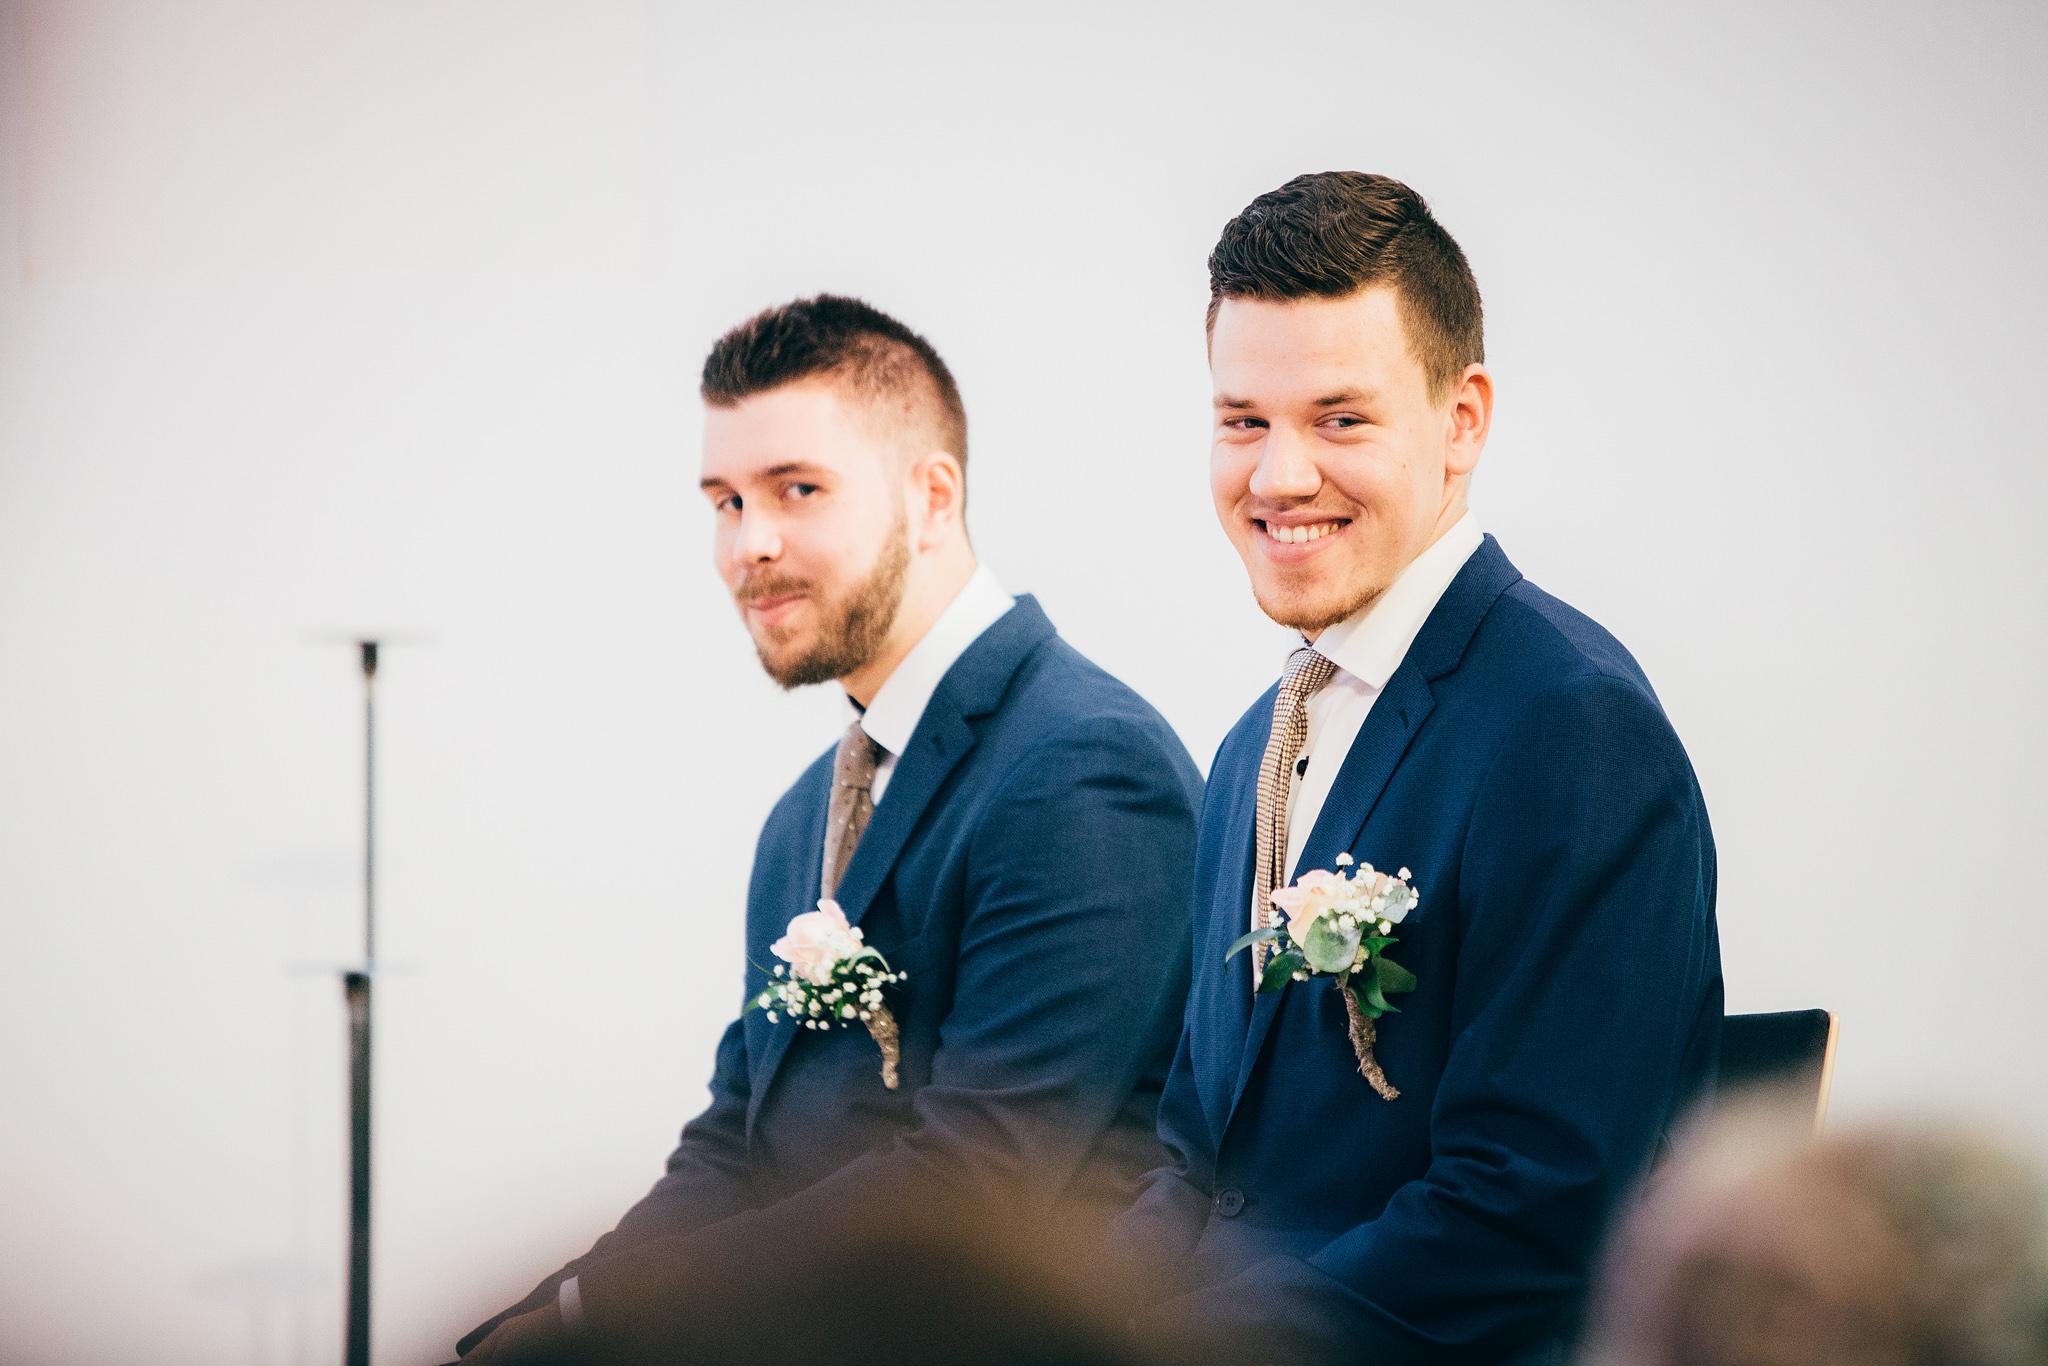 Norway+wedding+photographer+elopement+pre+wedding+Casey+Arneson-36.jpg